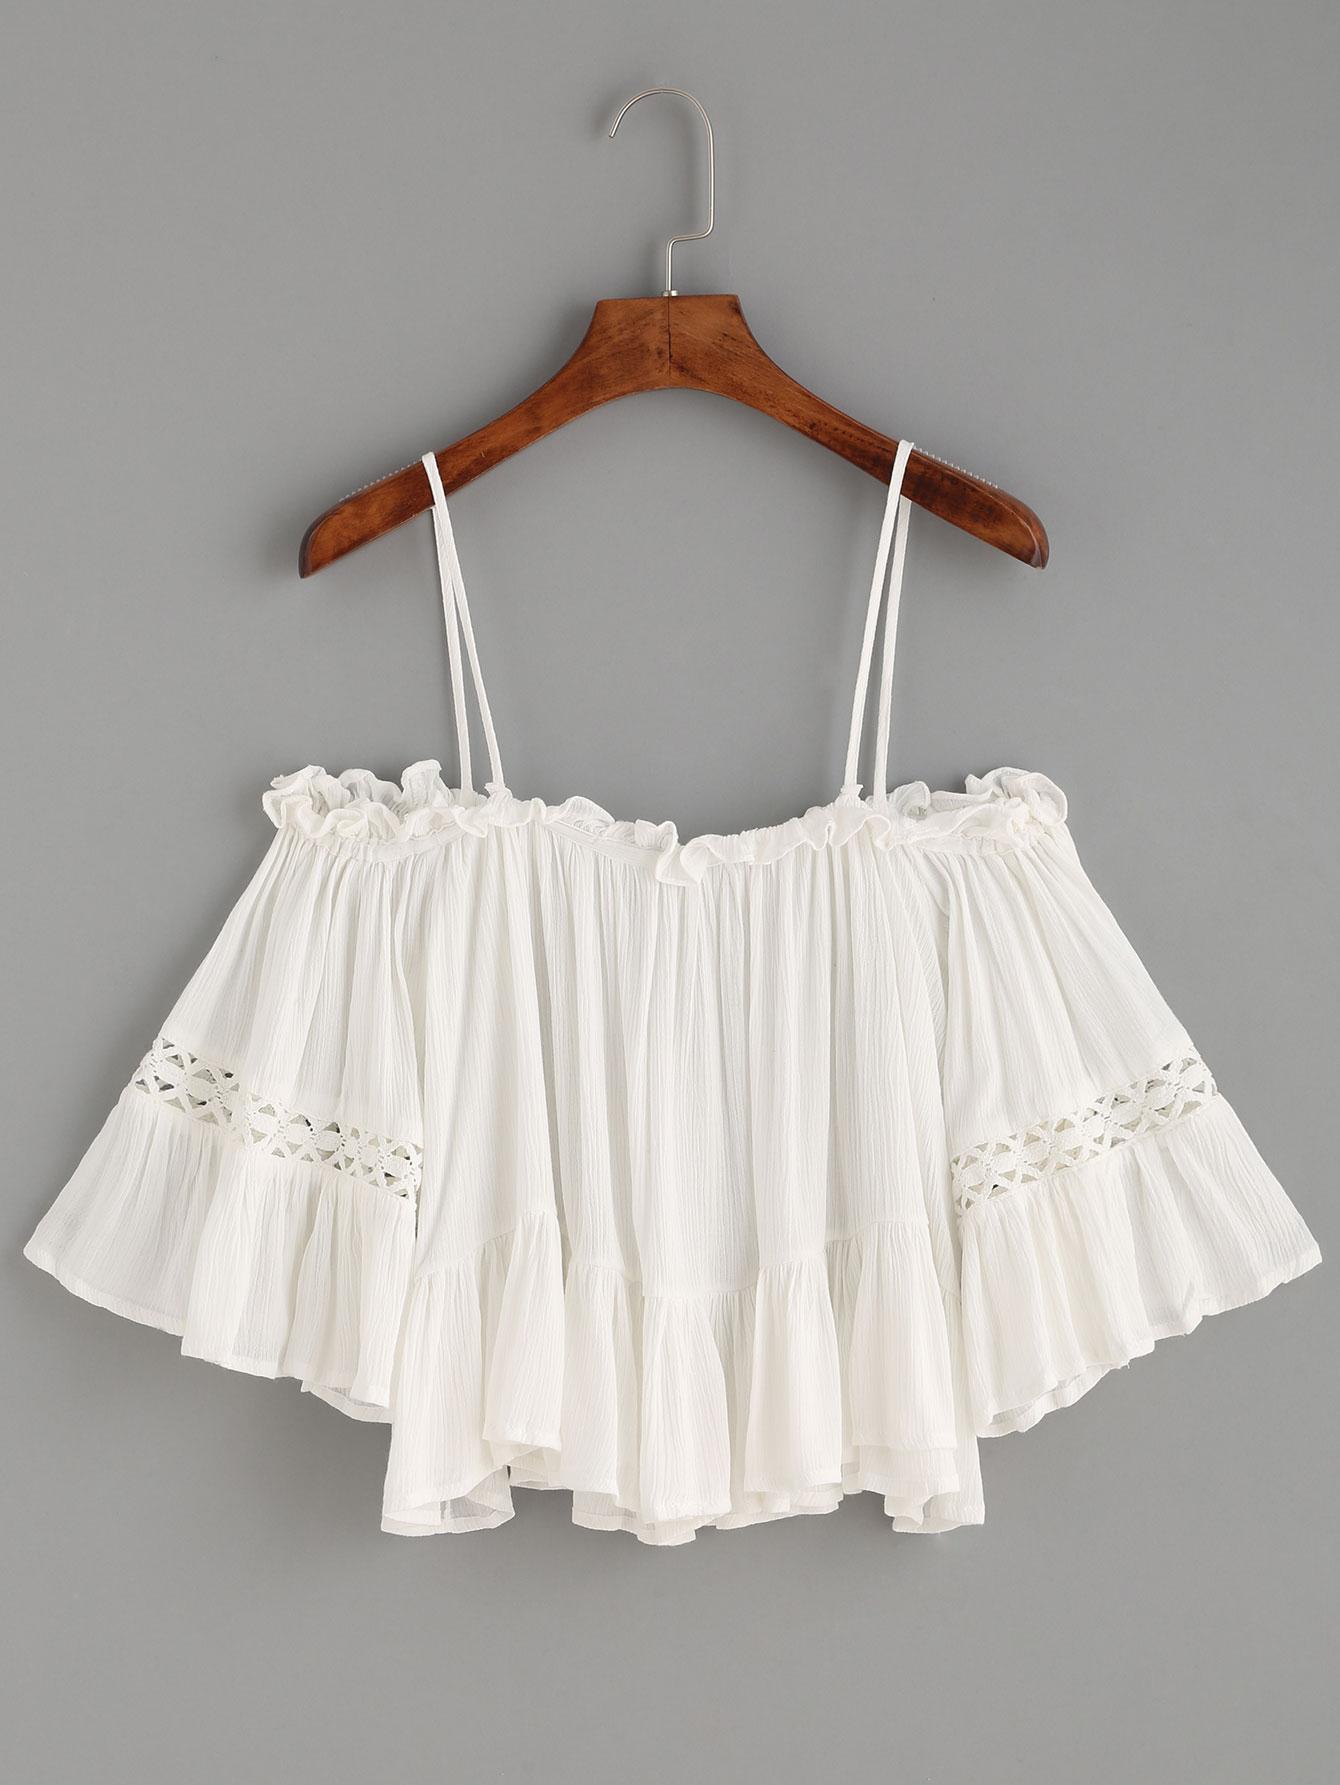 4b36353fdeadf9 White Crochet Insert Cold Shoulder Ruffle Top -SheIn(Sheinside)